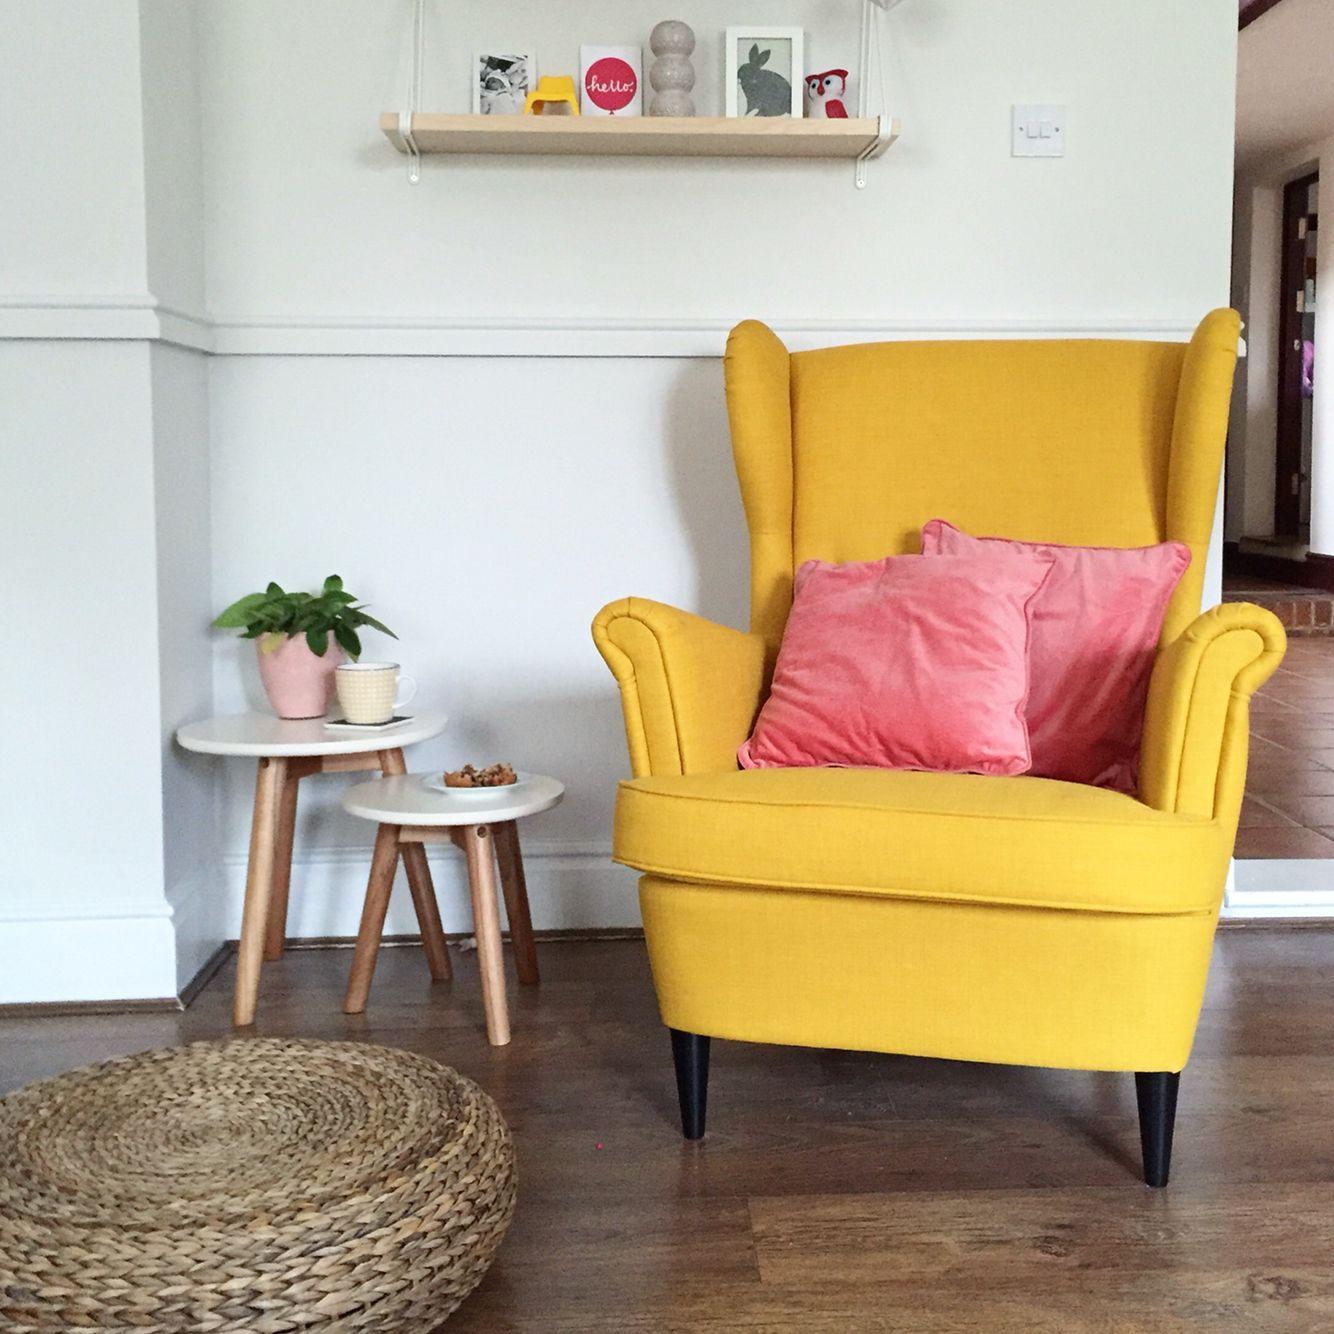 Furniture We Like Strandmon This Pic Looks Very Cozy Too